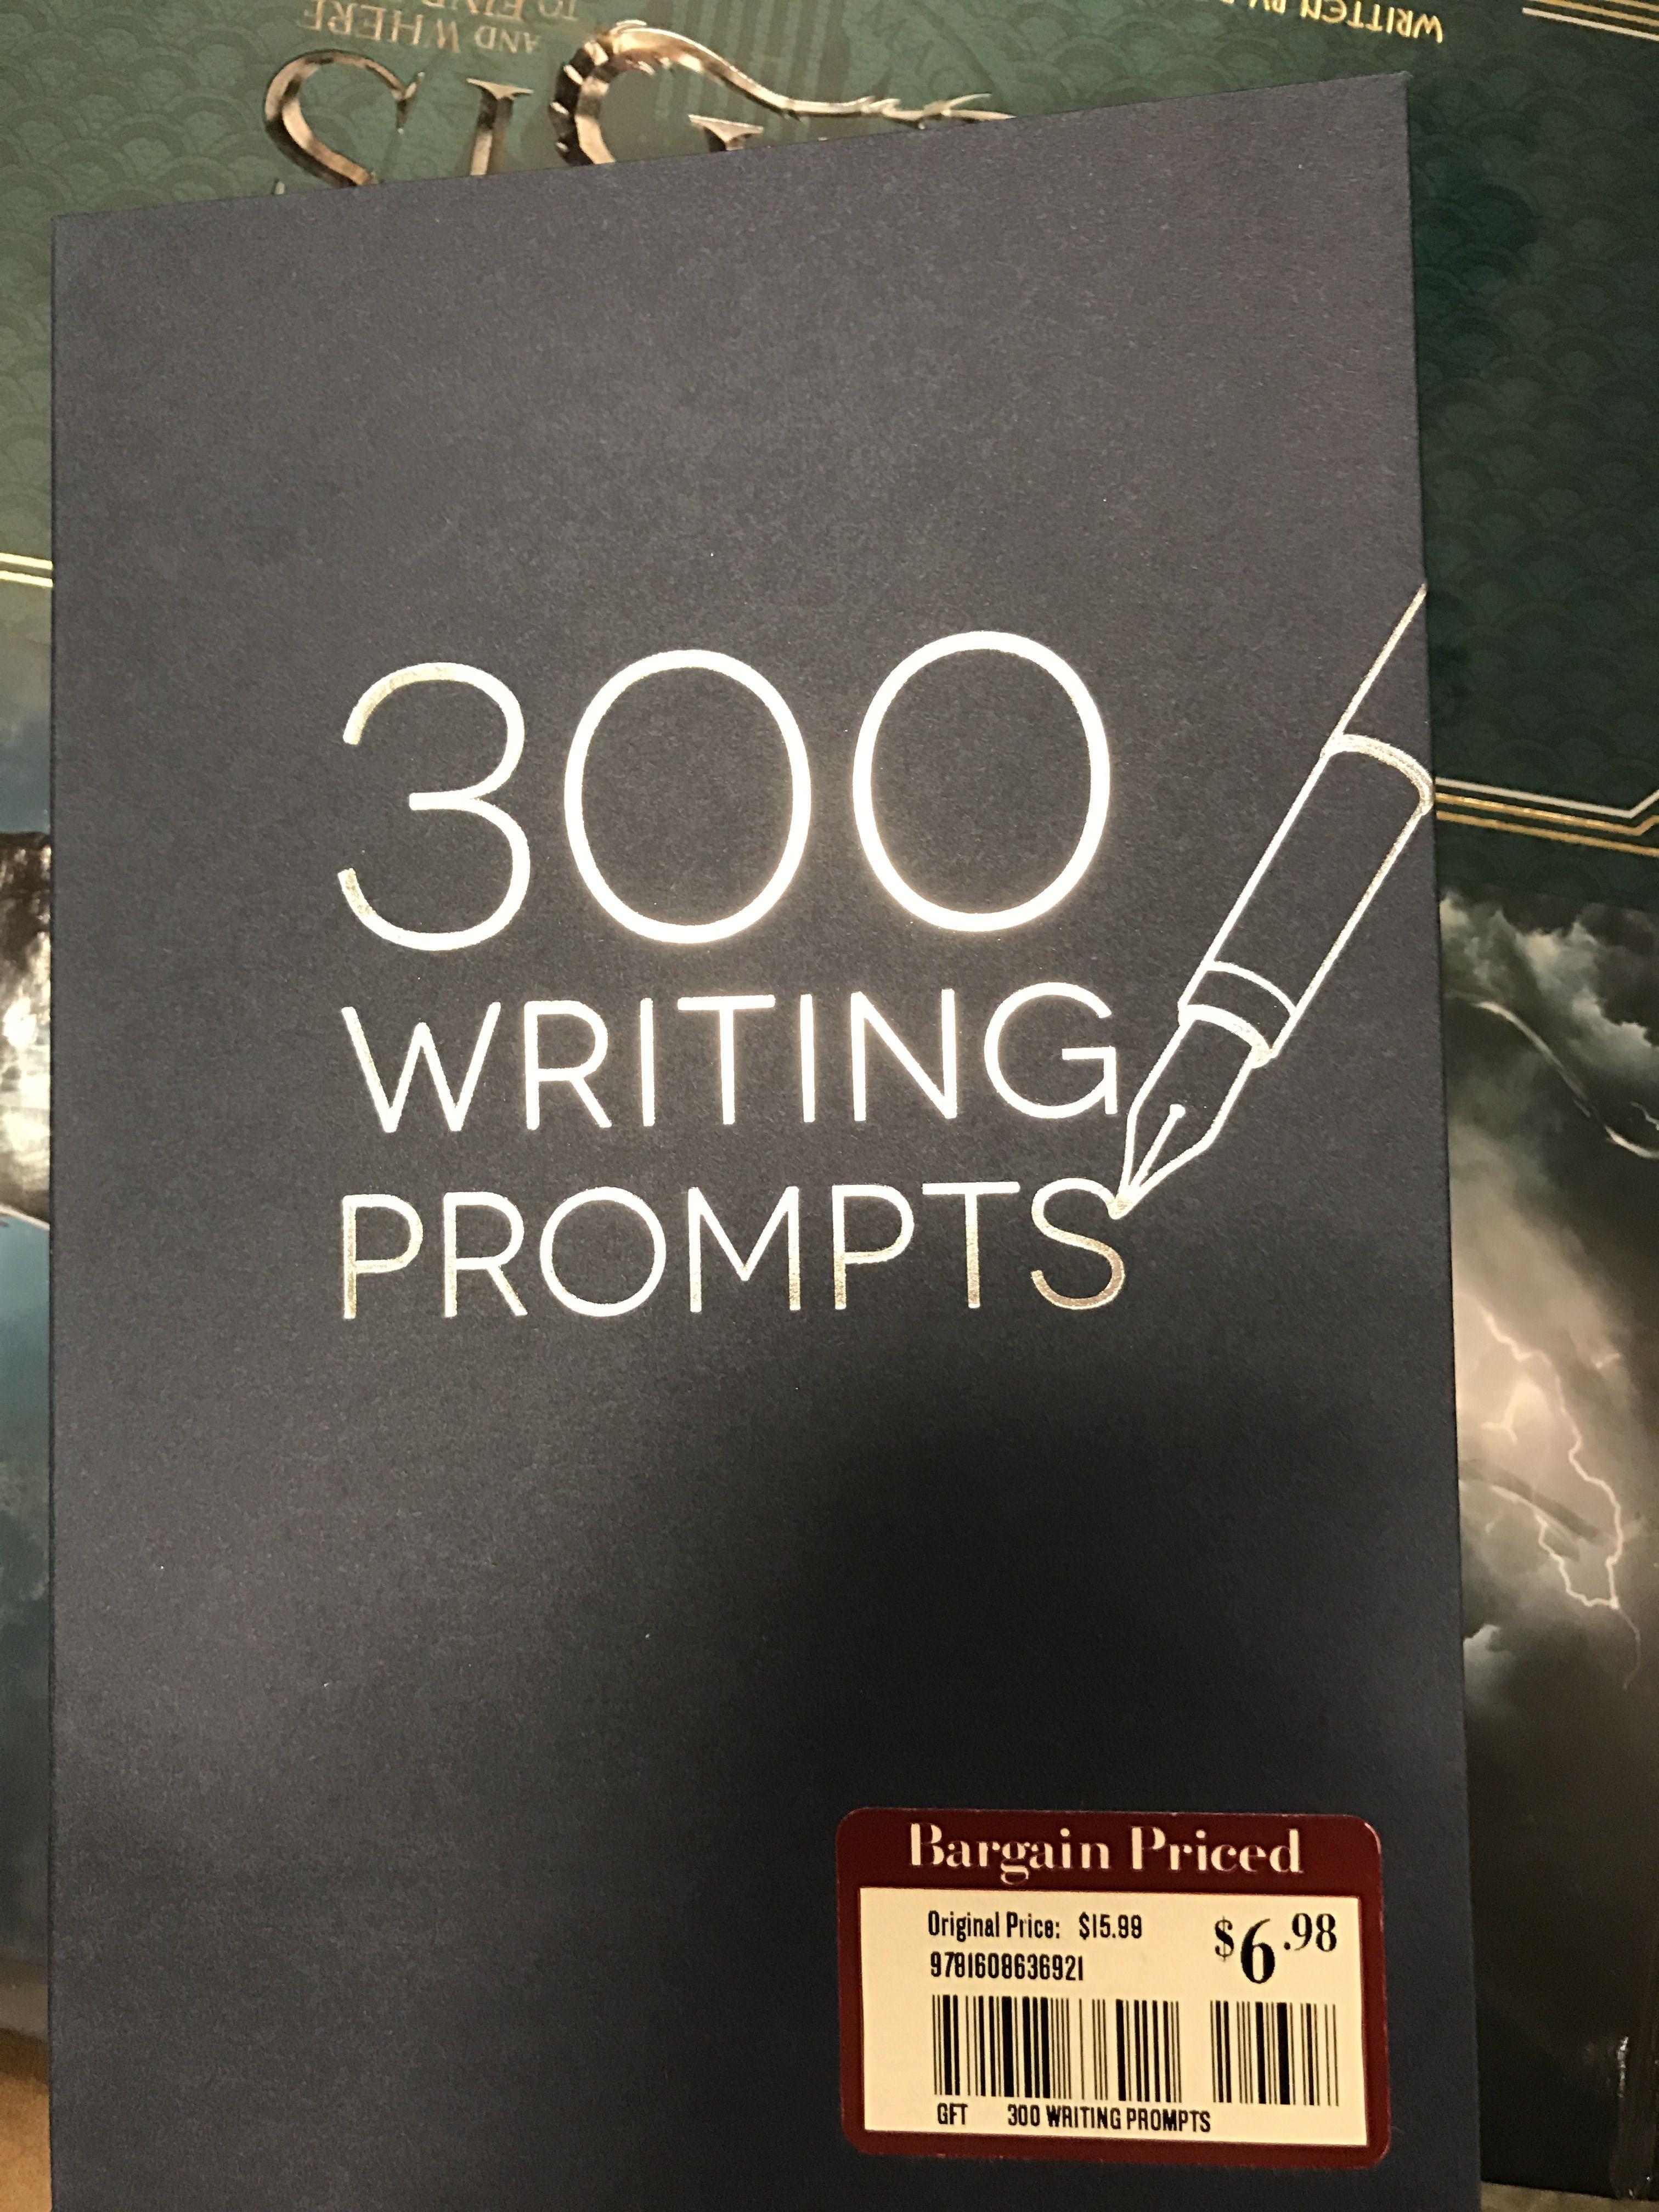 e8e285c0bb 300 Writing Prompts Barnes and noble  6.98